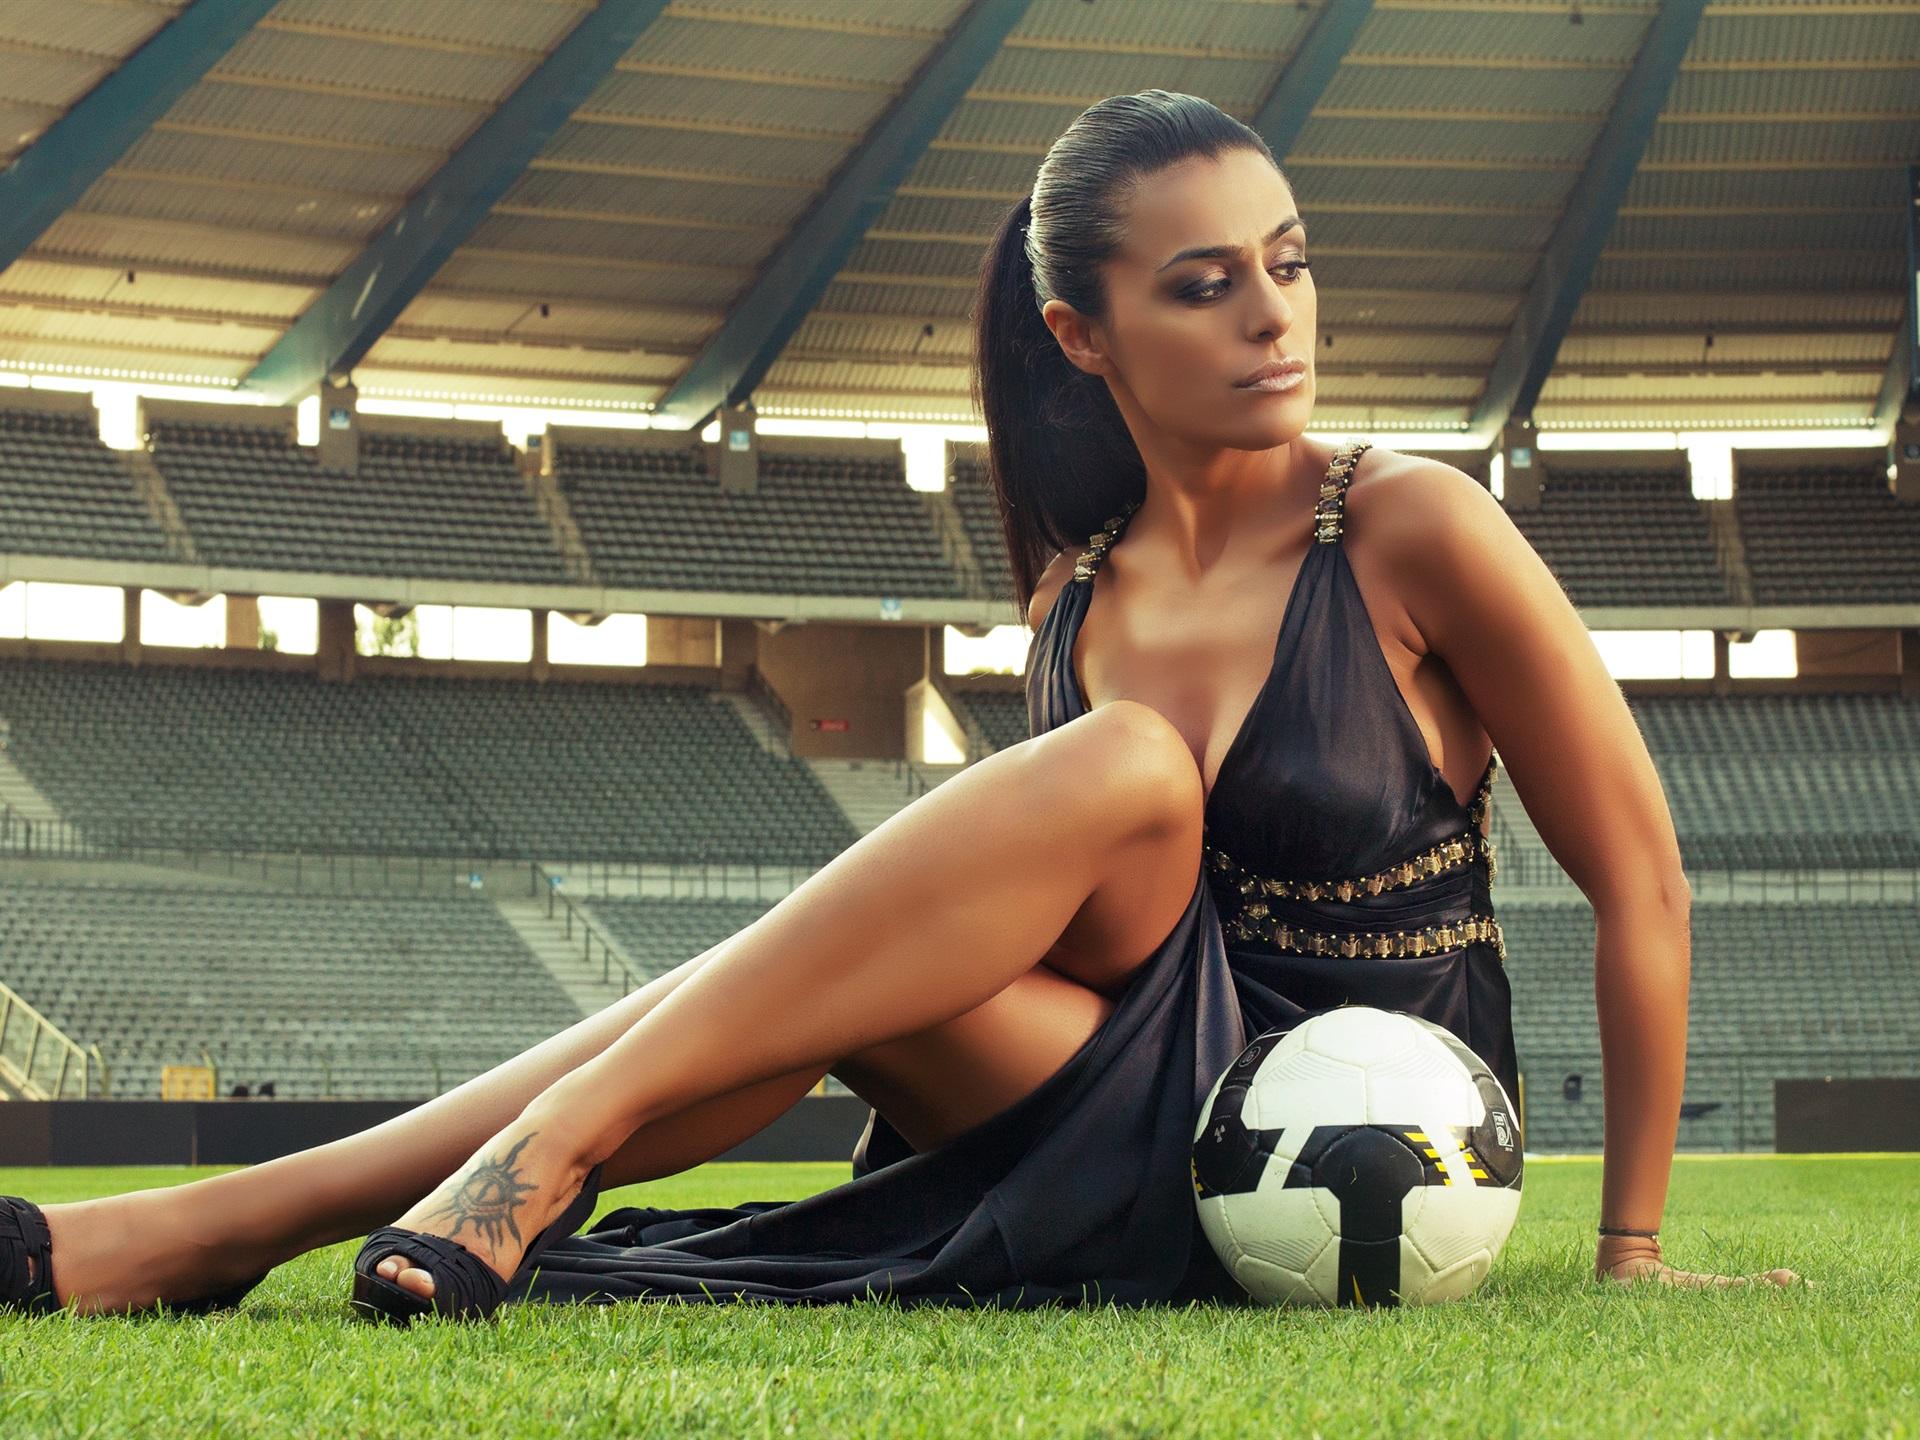 Stadium Soccer Football Sports Qhd Wallpaper 2560x2560: 壁紙 セクシーな女の子、サッカー、スタジアム 2560x1600 HD 無料のデスクトップの背景, 画像